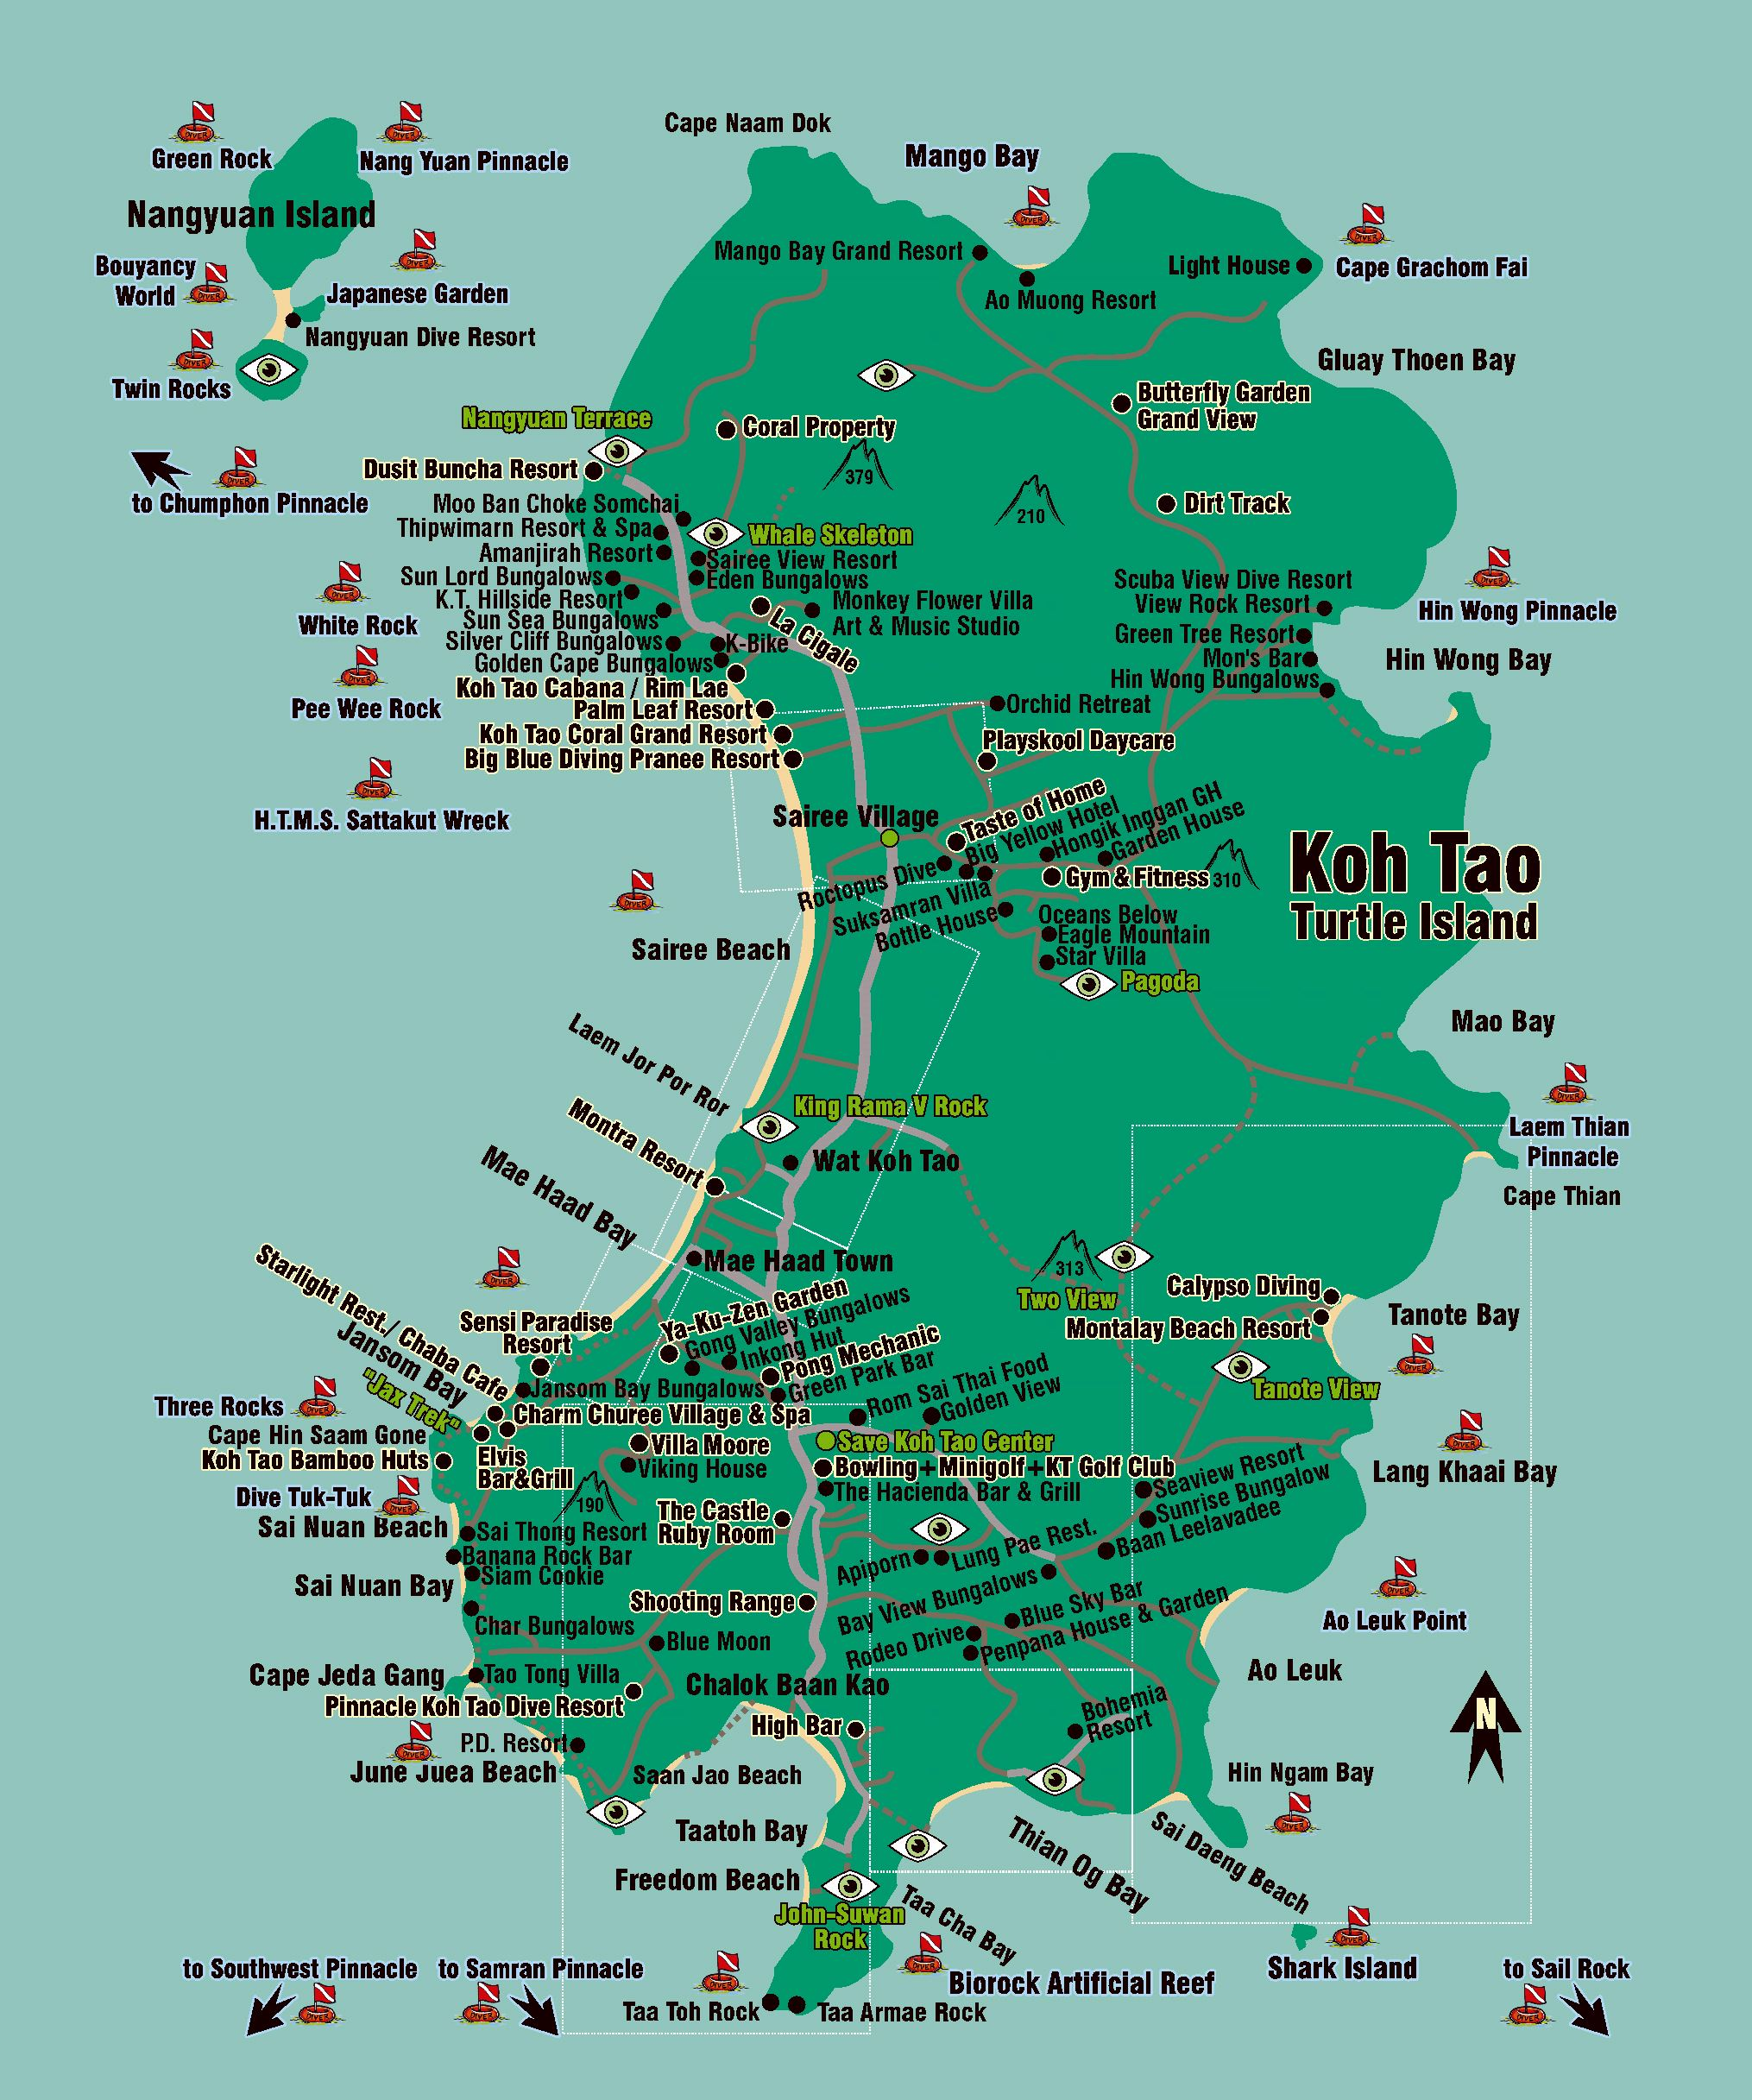 Carte Routiere Thailande A Imprimer.Cartes De Ile De Ko Tao Cartes Typographiques Detaillees